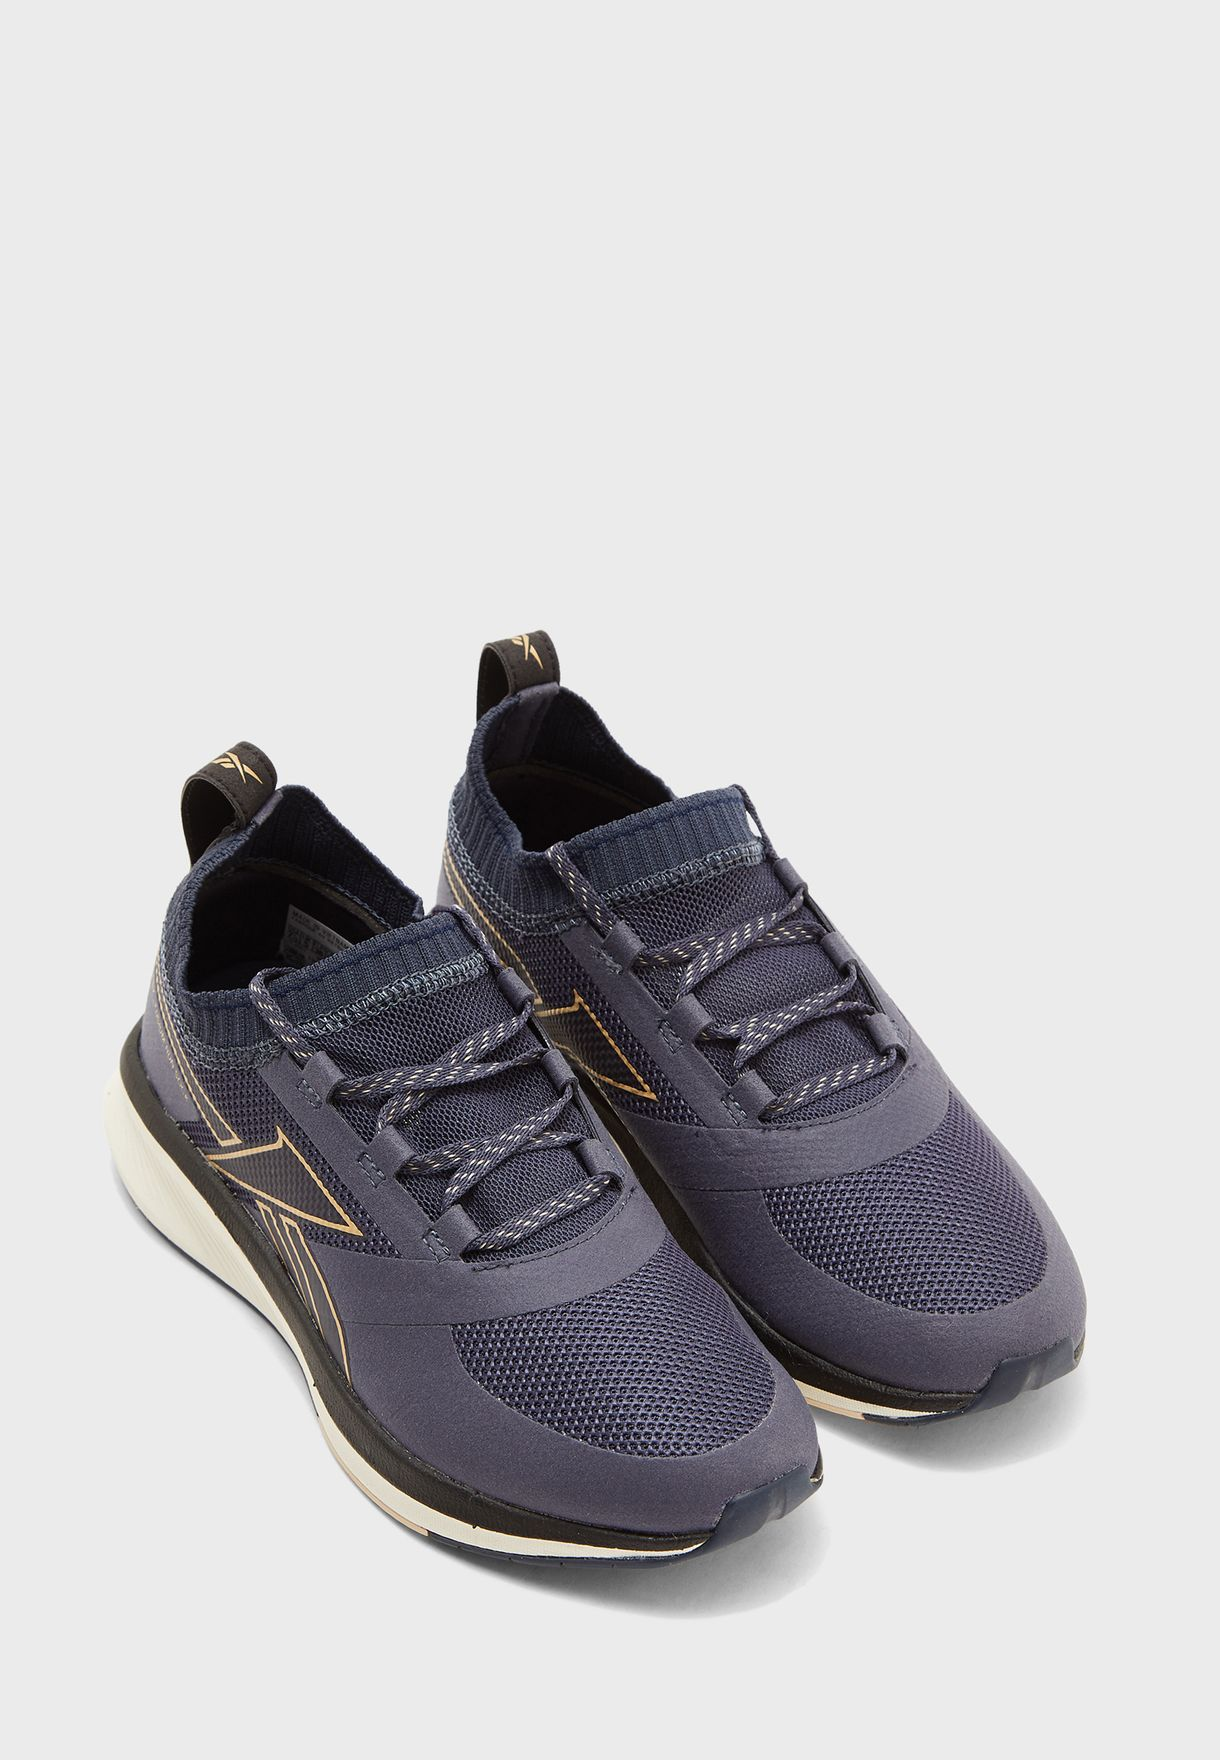 Buy Reebok Navy Fusium Run 20 Sock For Women In Mena Worldwide Eh0399